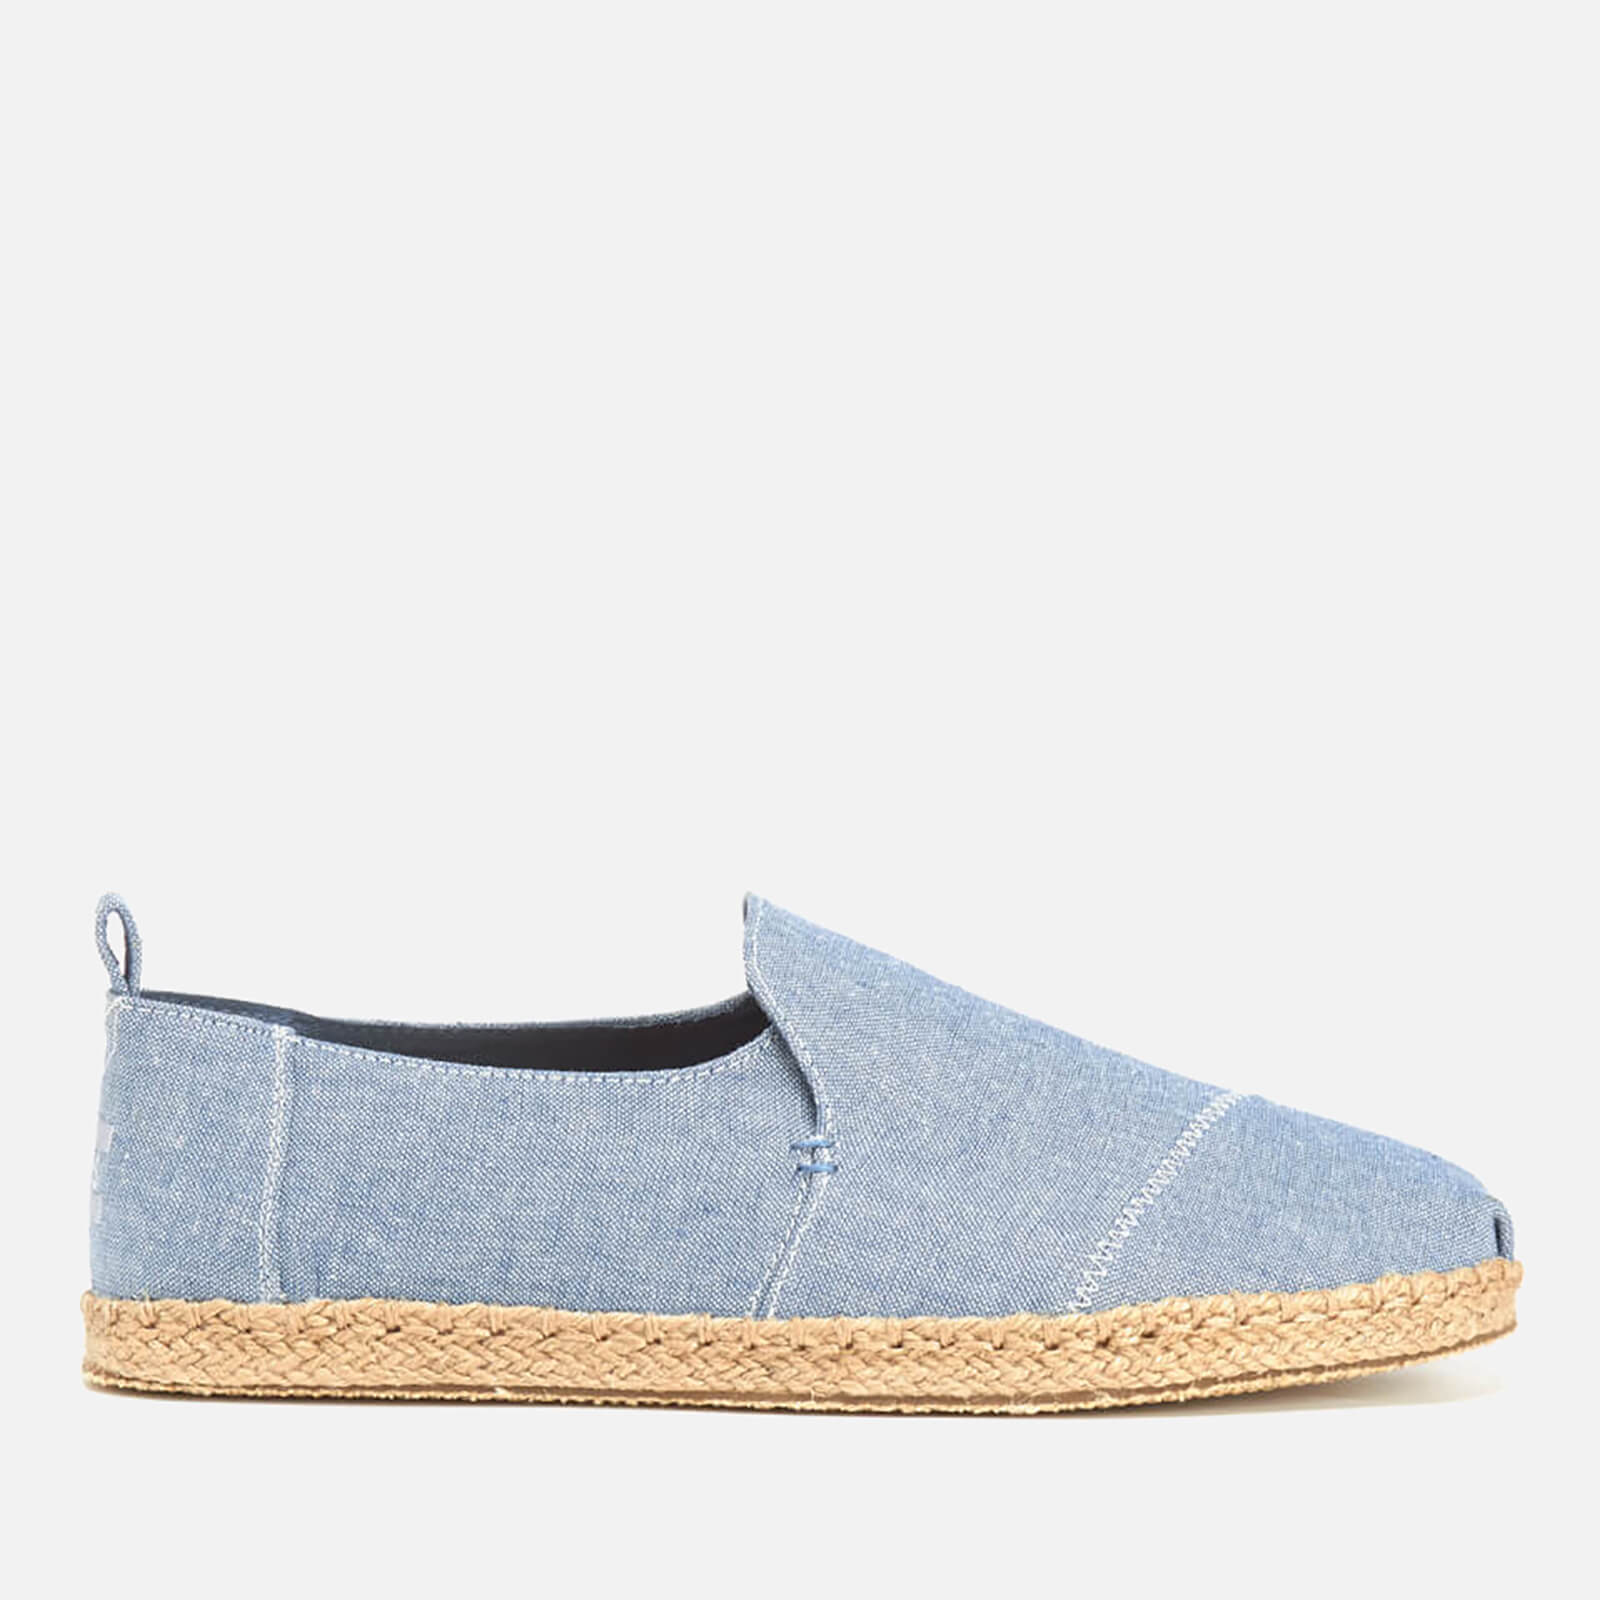 ef4c1169f40 TOMS Men s Deconstructed Alpargata Espadrille Slip-On Pumps - Cornflower  Blue Slub Chambray Mens Footwear